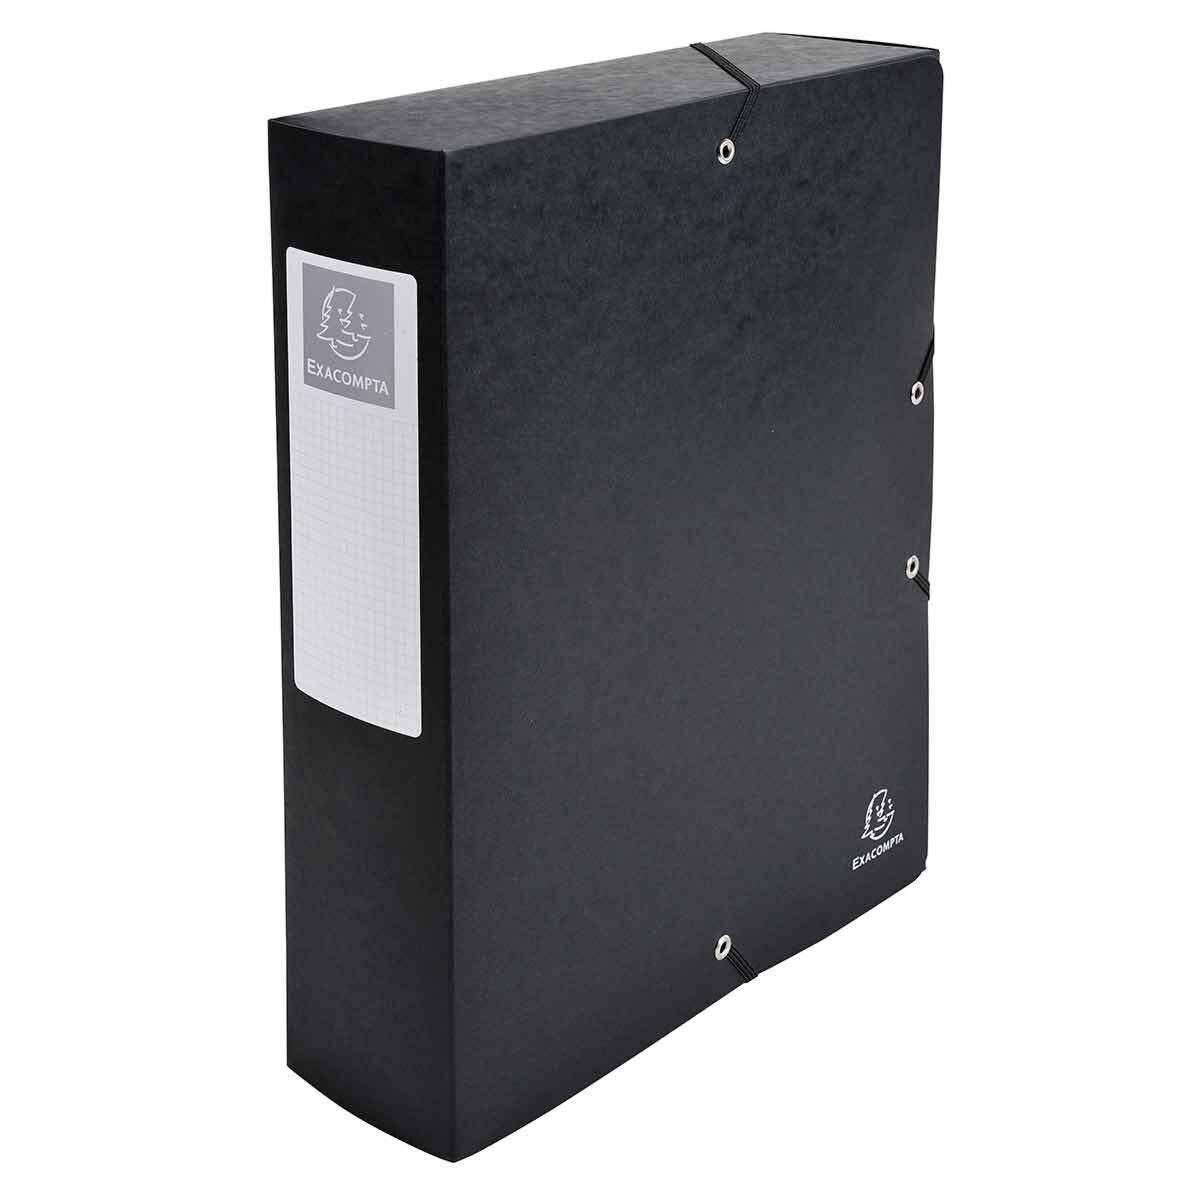 Exacompta Elasticated Box File Pressboard A4 80mm Pack of 6 Black